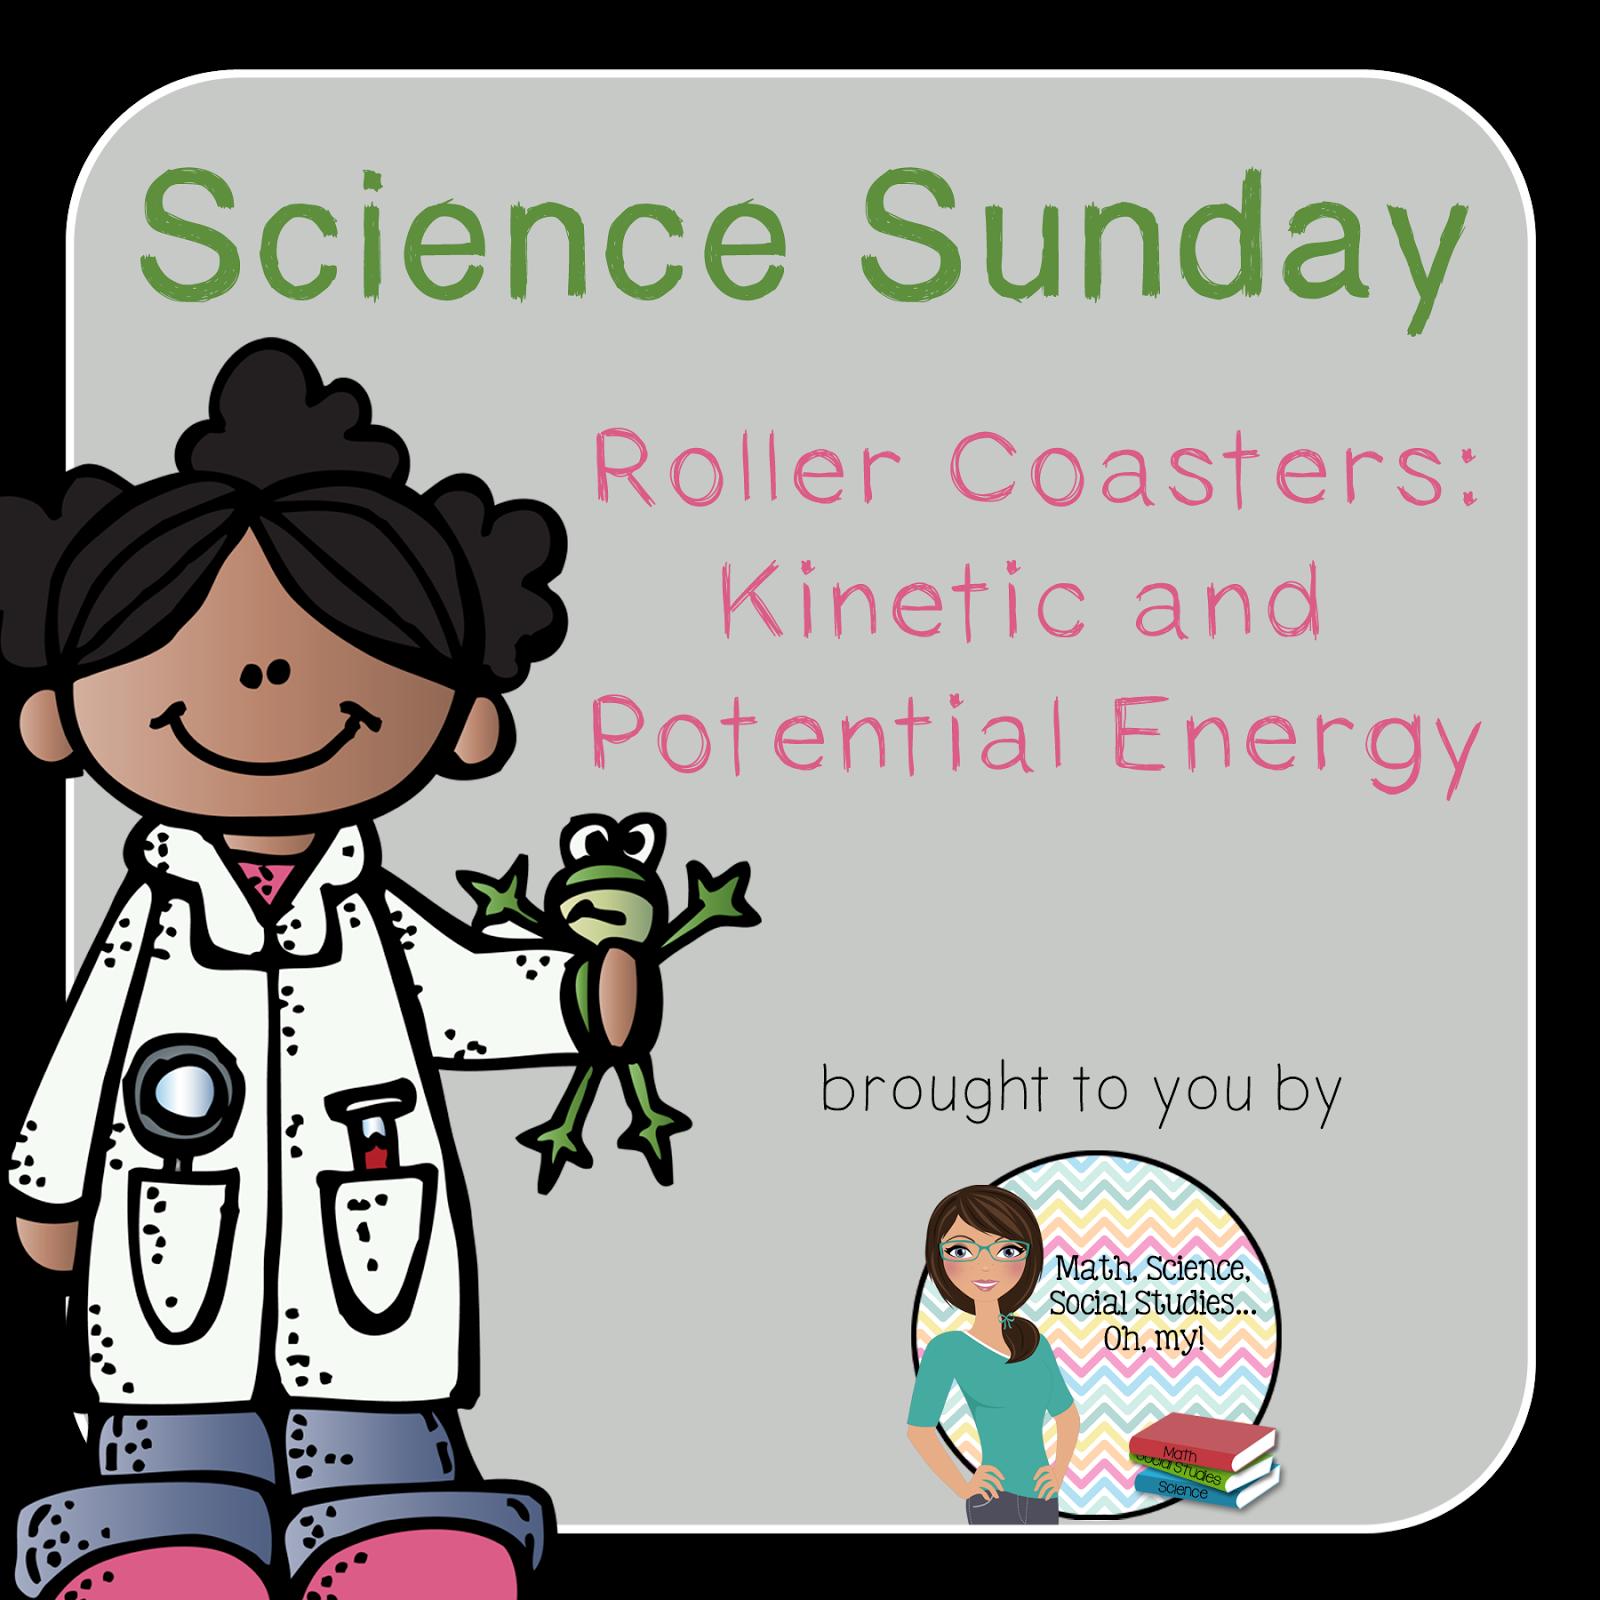 Math Science Social Stu S Oh My Science Sunday Roller Coaster Fun